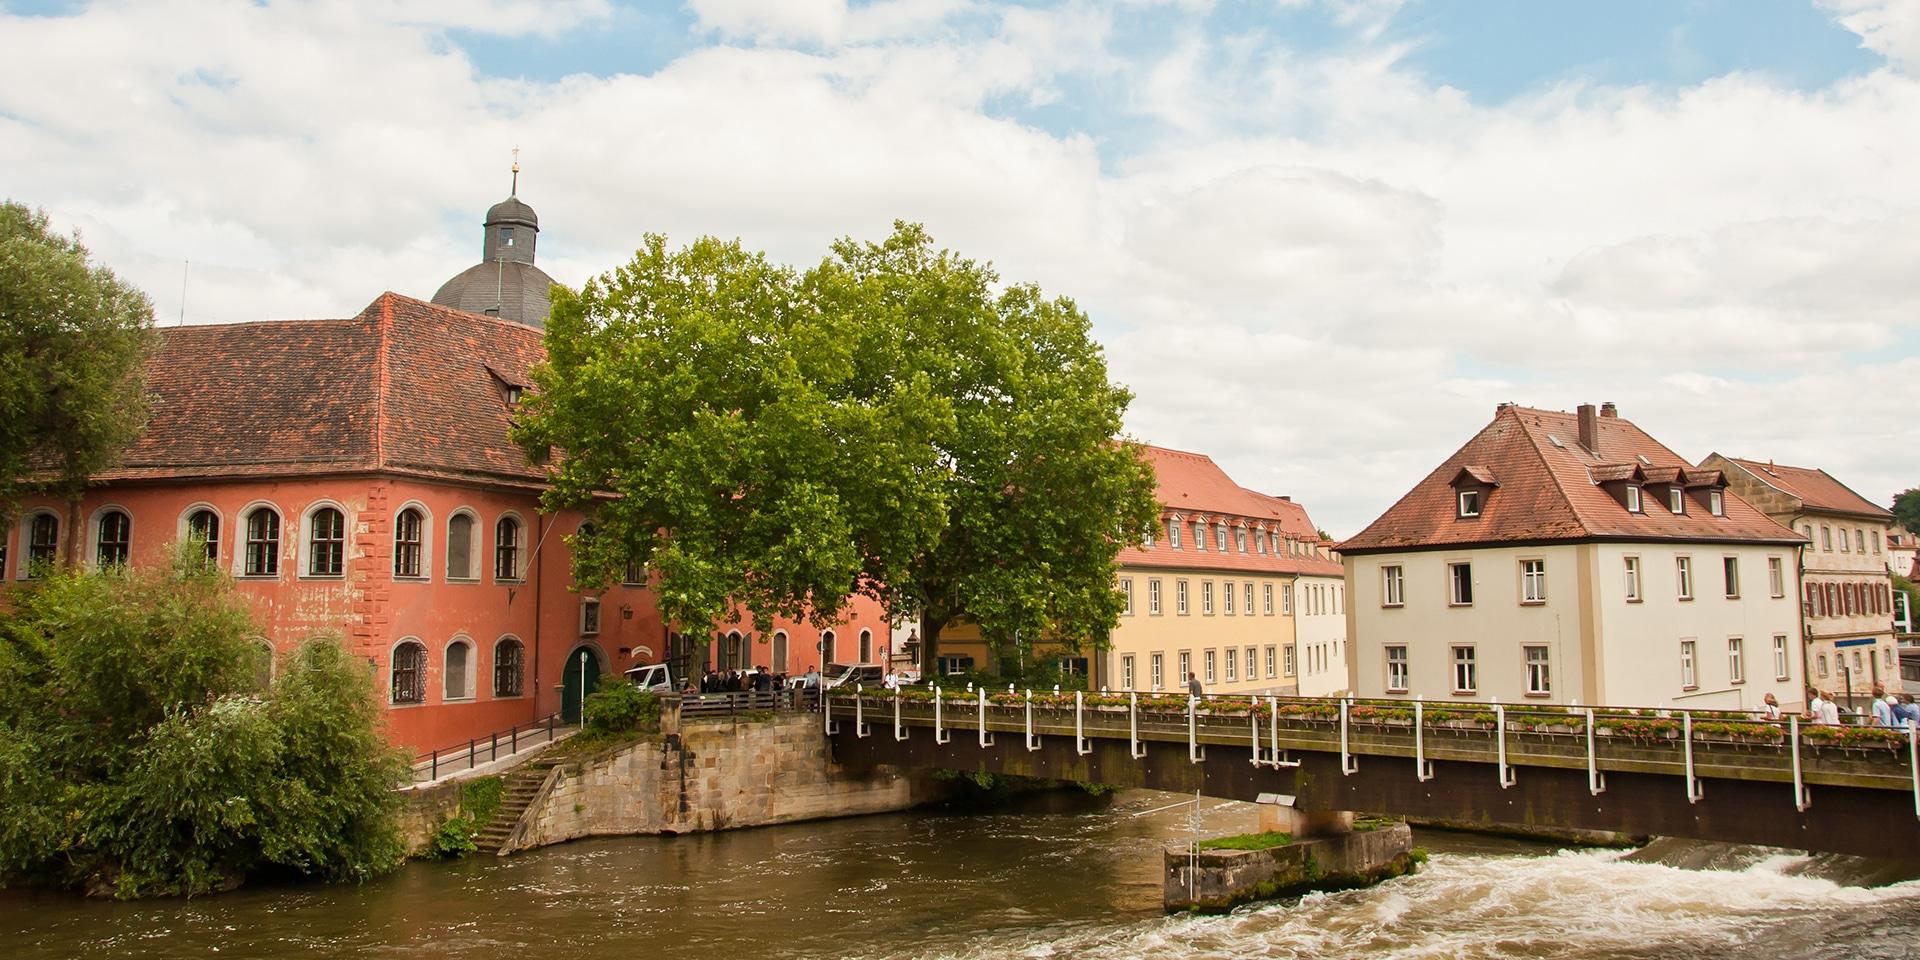 schloss geyerswoerth - Schloss Geyerswörth